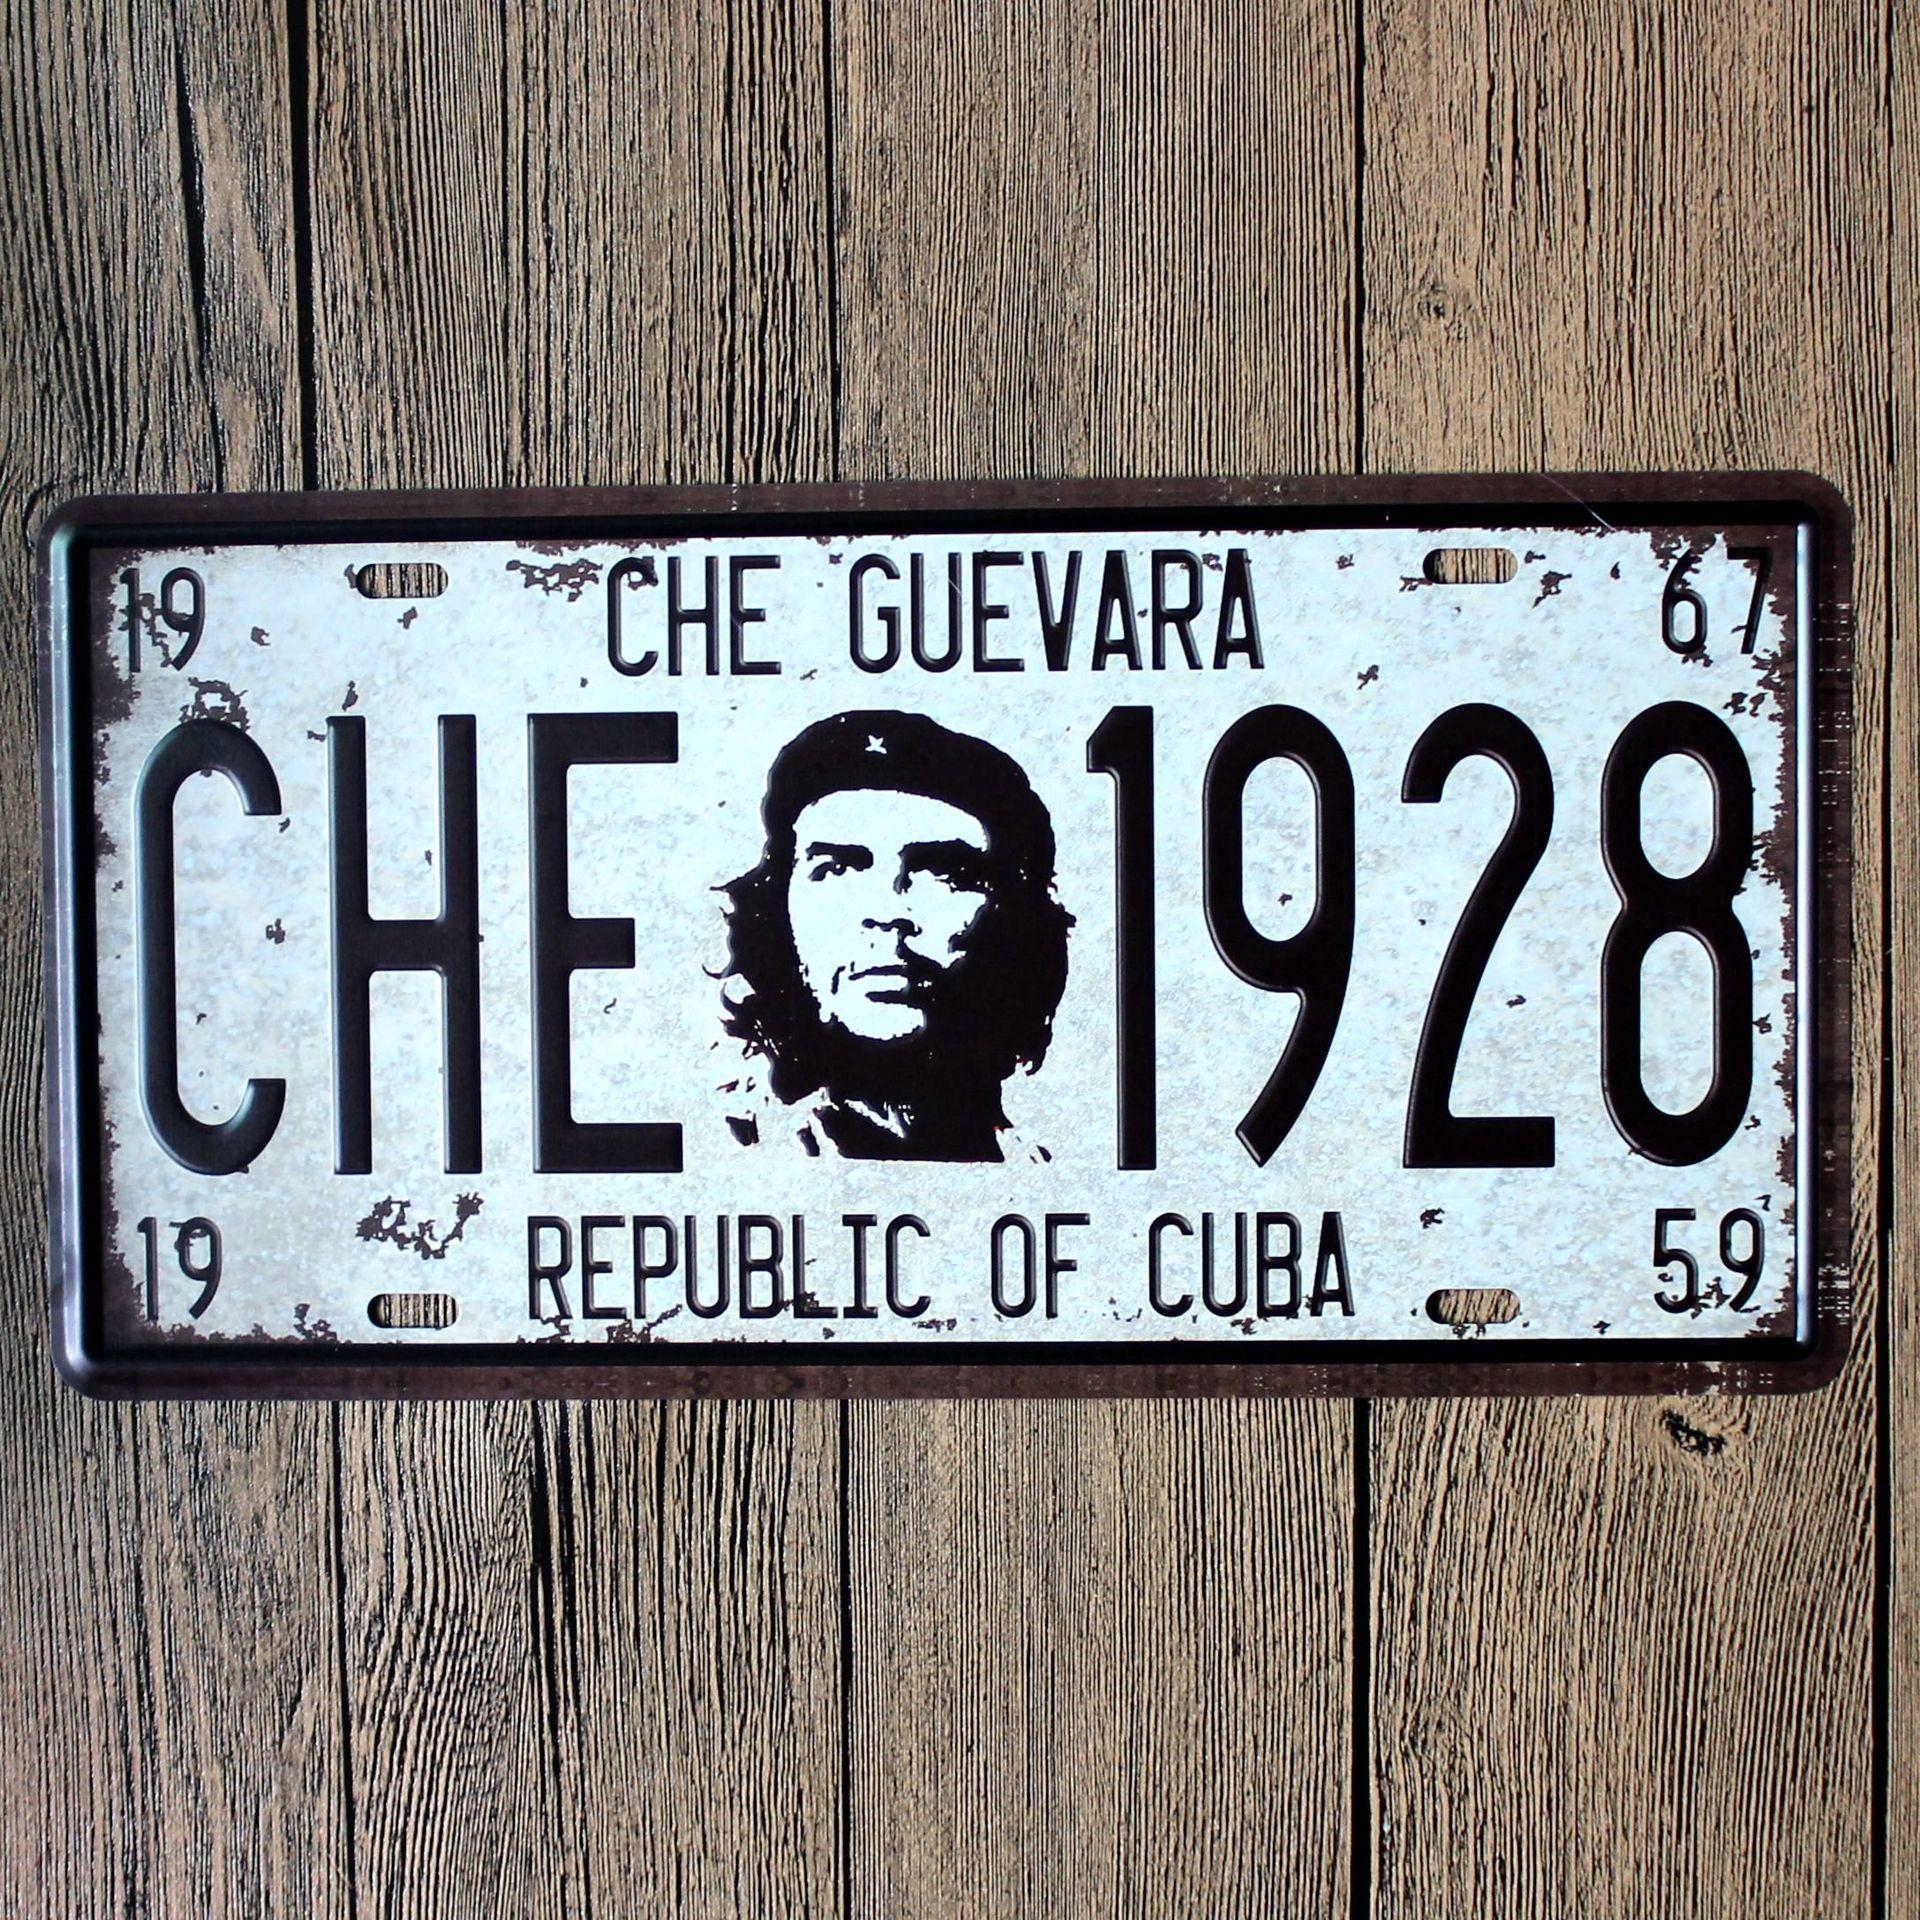 Che Guevara Che 726 Car Number Plates Retro Metal poster Tin Sign tps Home Pub Bar Decor 6